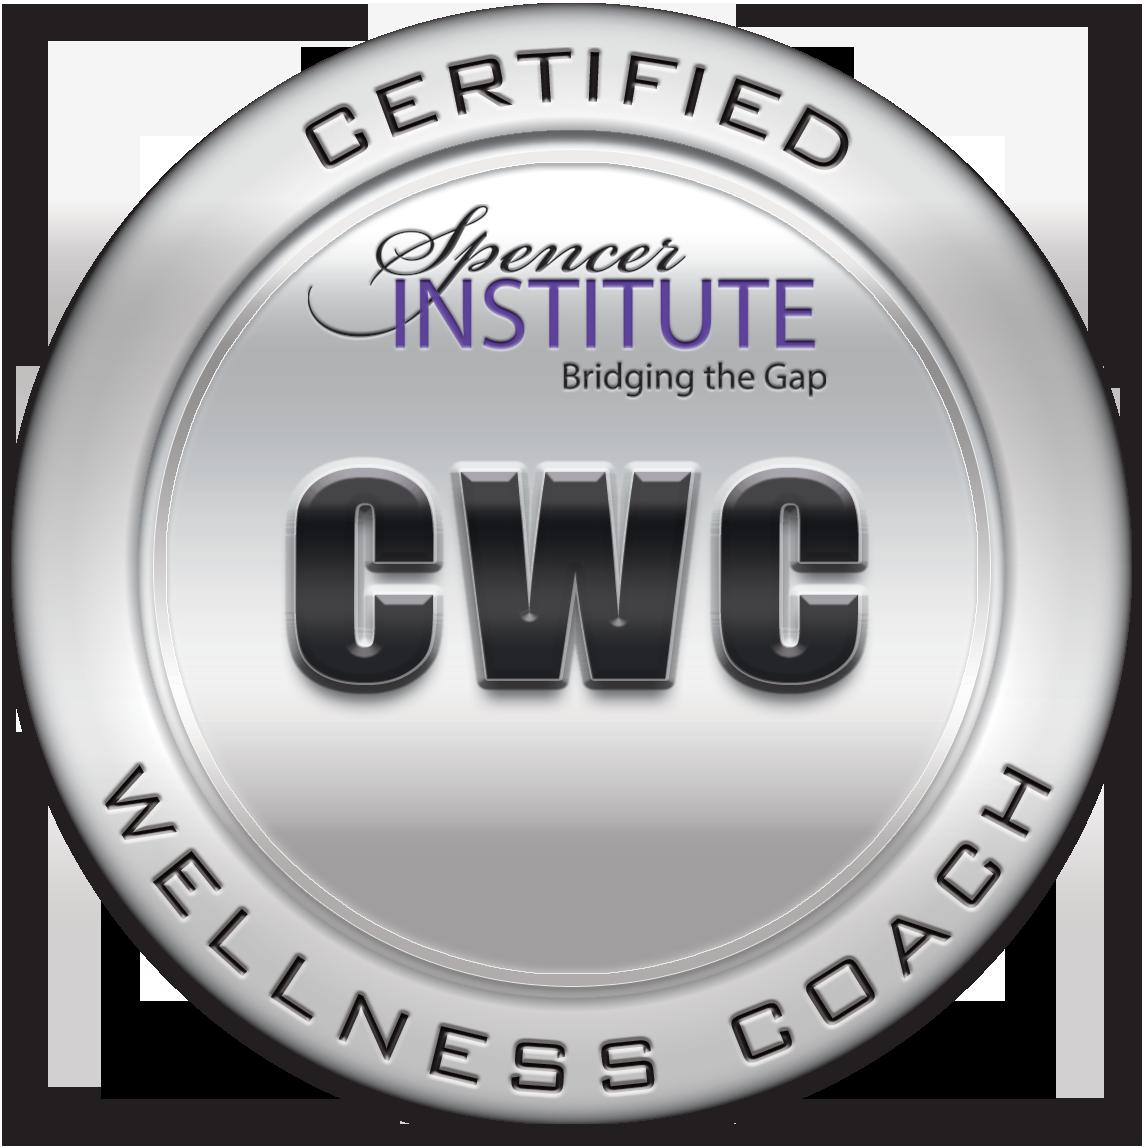 The spencer institute offers wellness coach certification to meet wellness coach trainingbecome a certified wellness coach xflitez Image collections